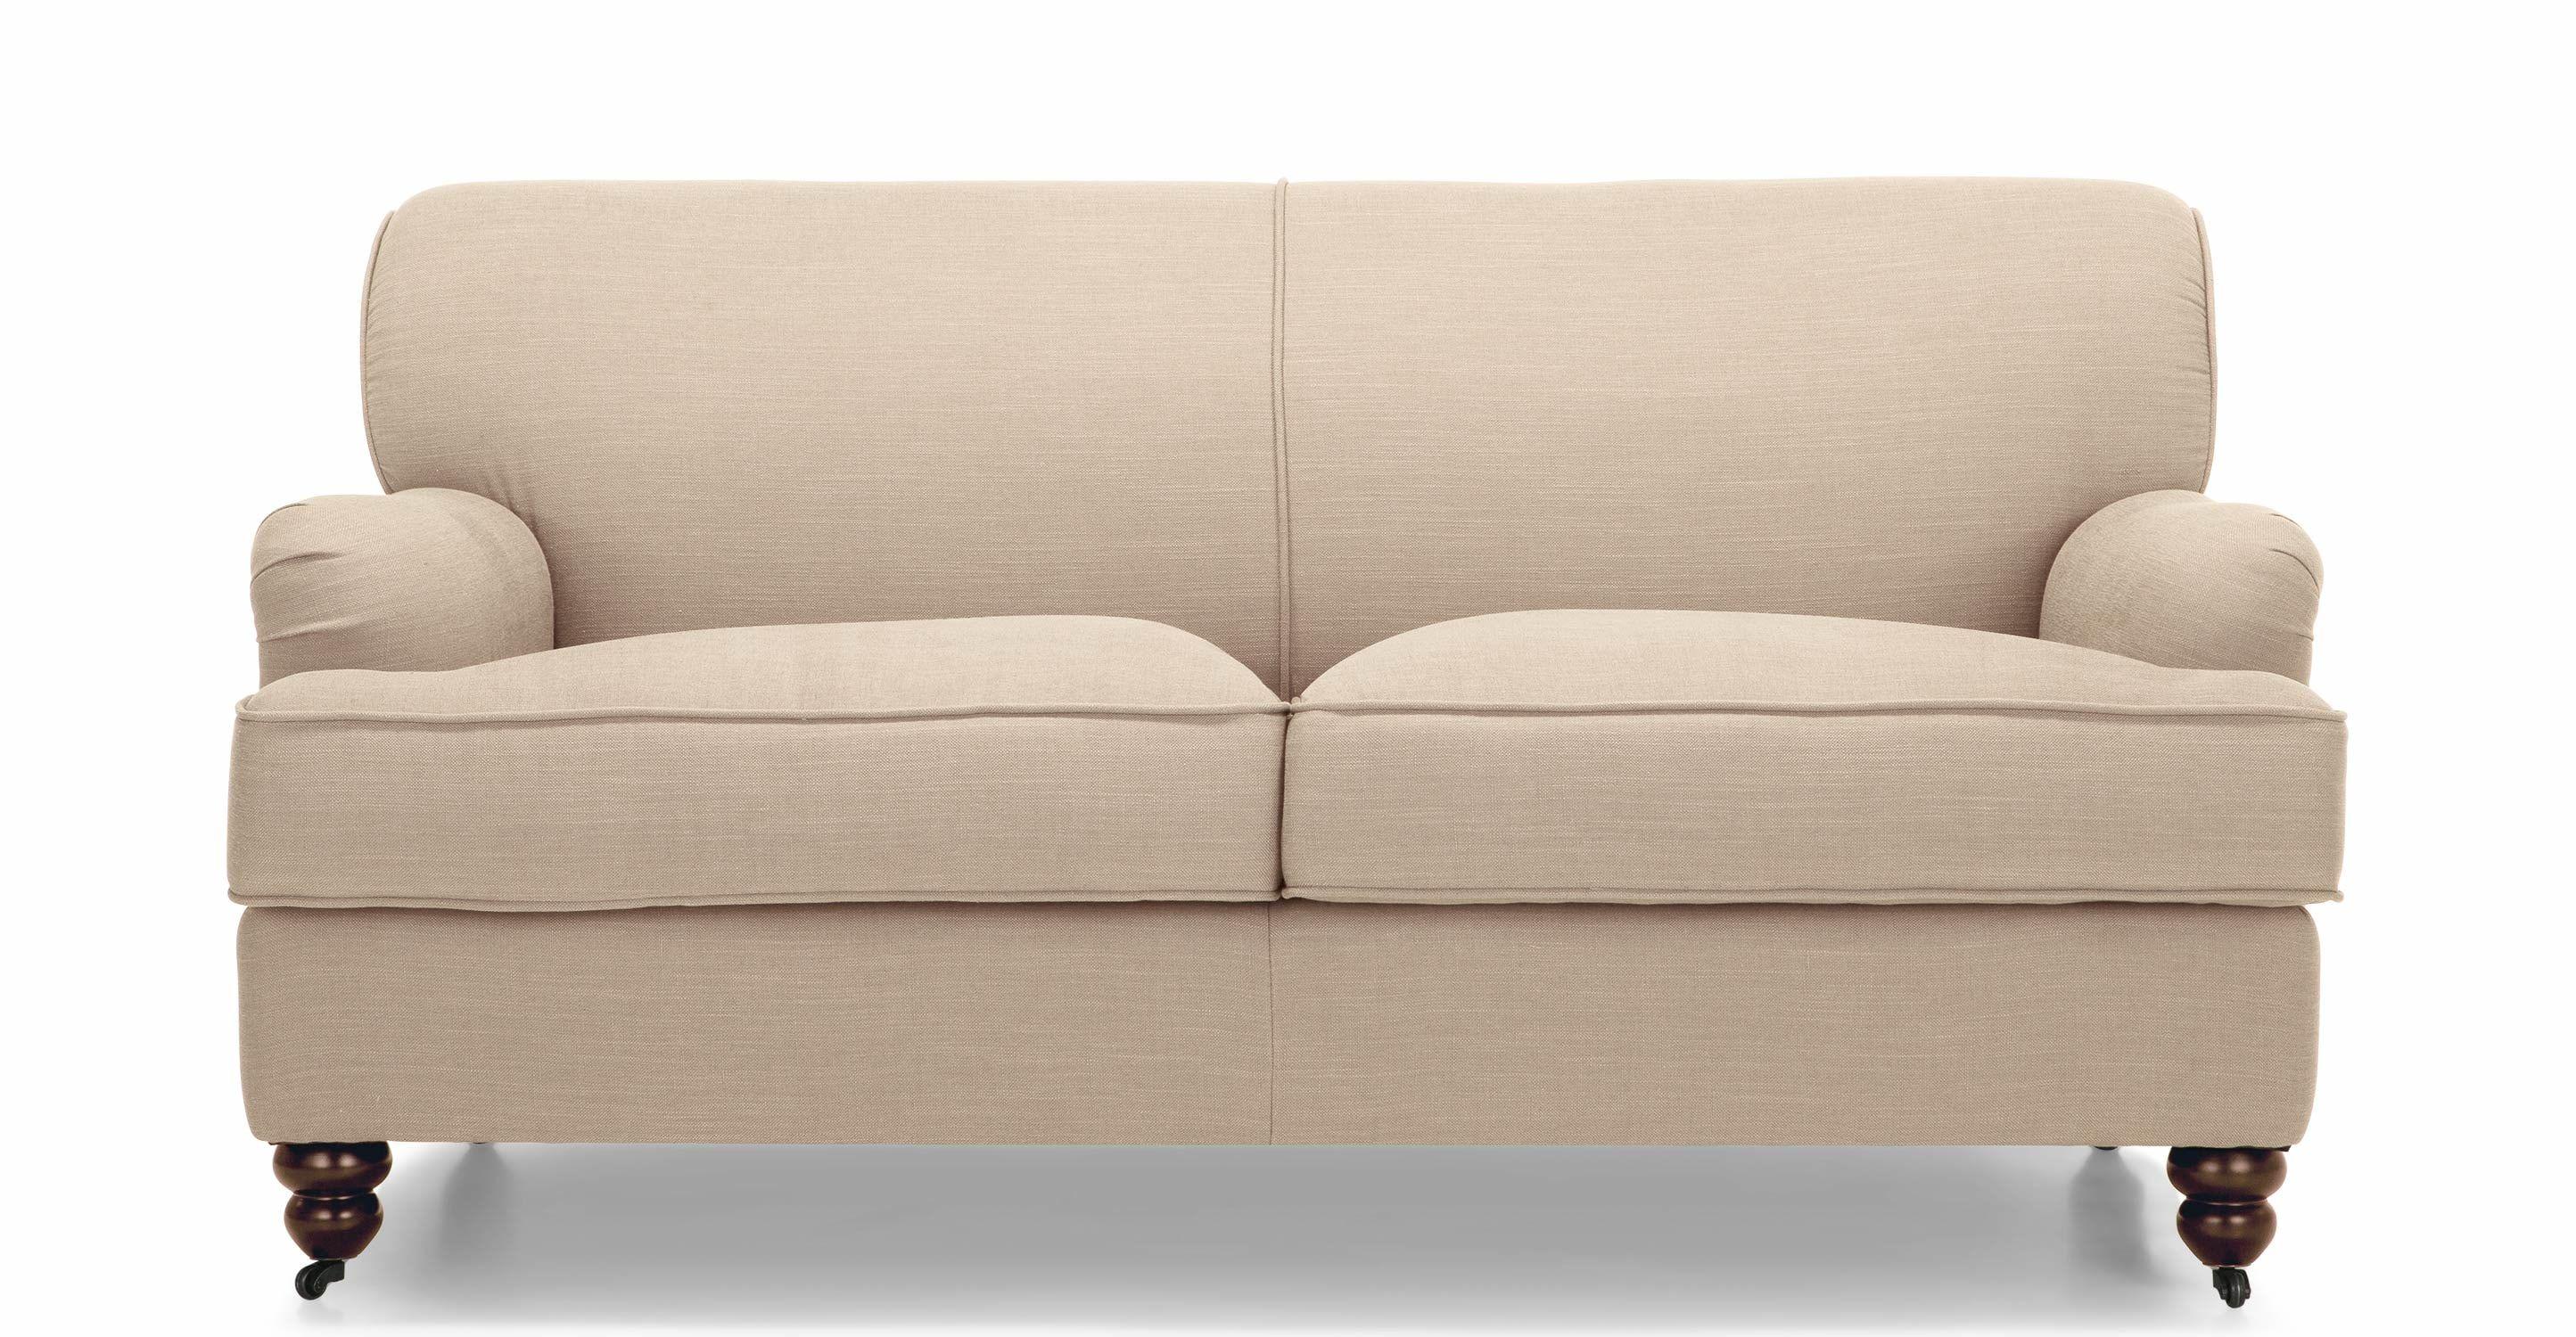 Orson 2 Seater Sofa, Biscuit Beige